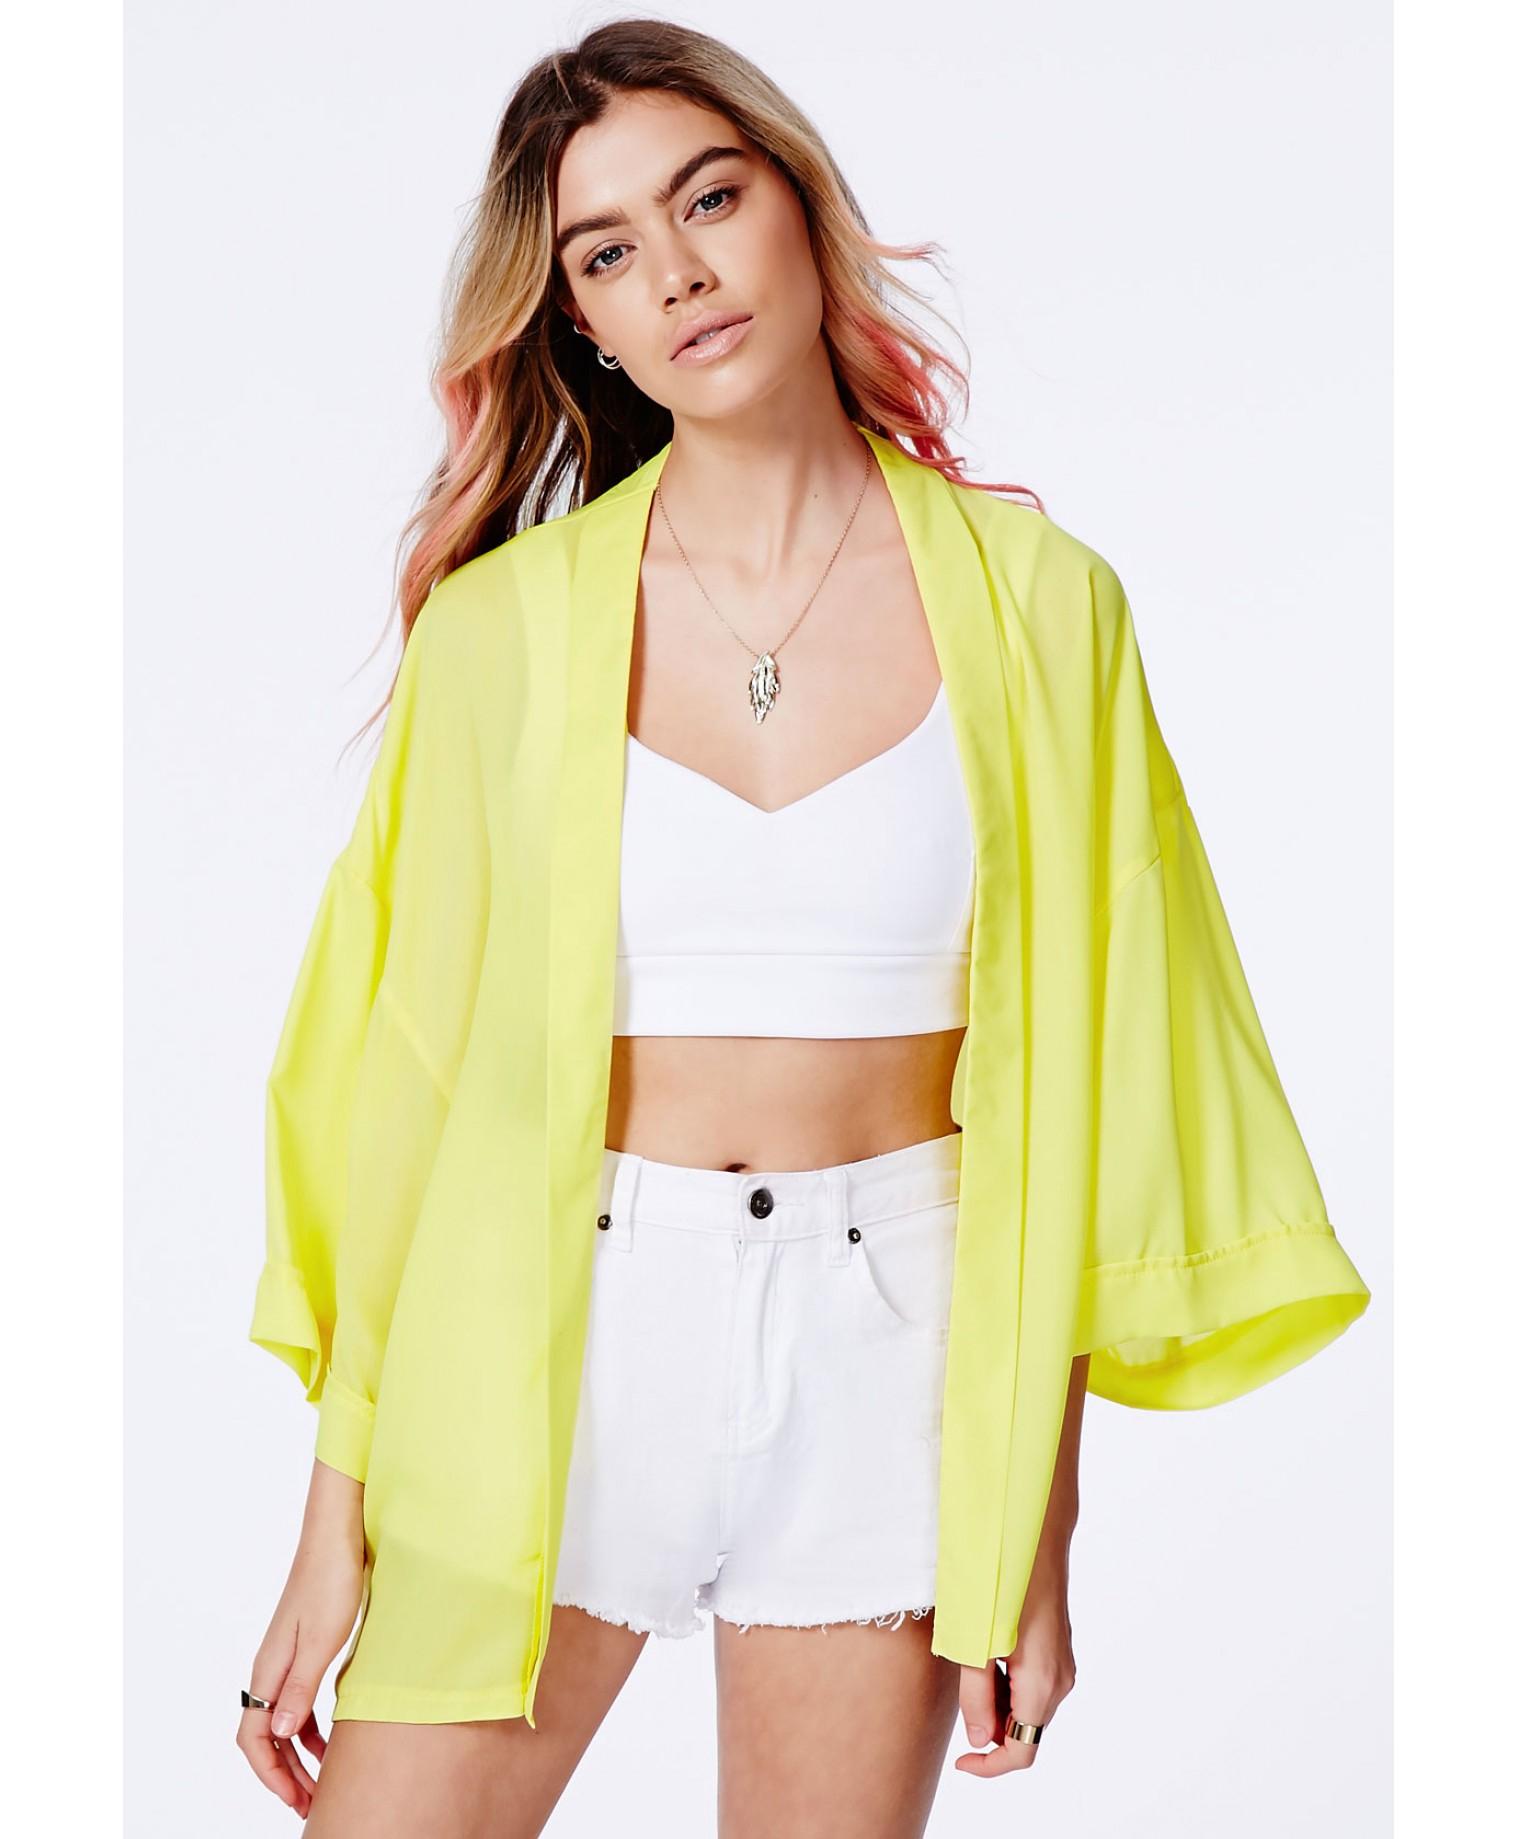 8407264cfd00f Lyst - Missguided Mima Yellow Kimono In Chiffon in Yellow